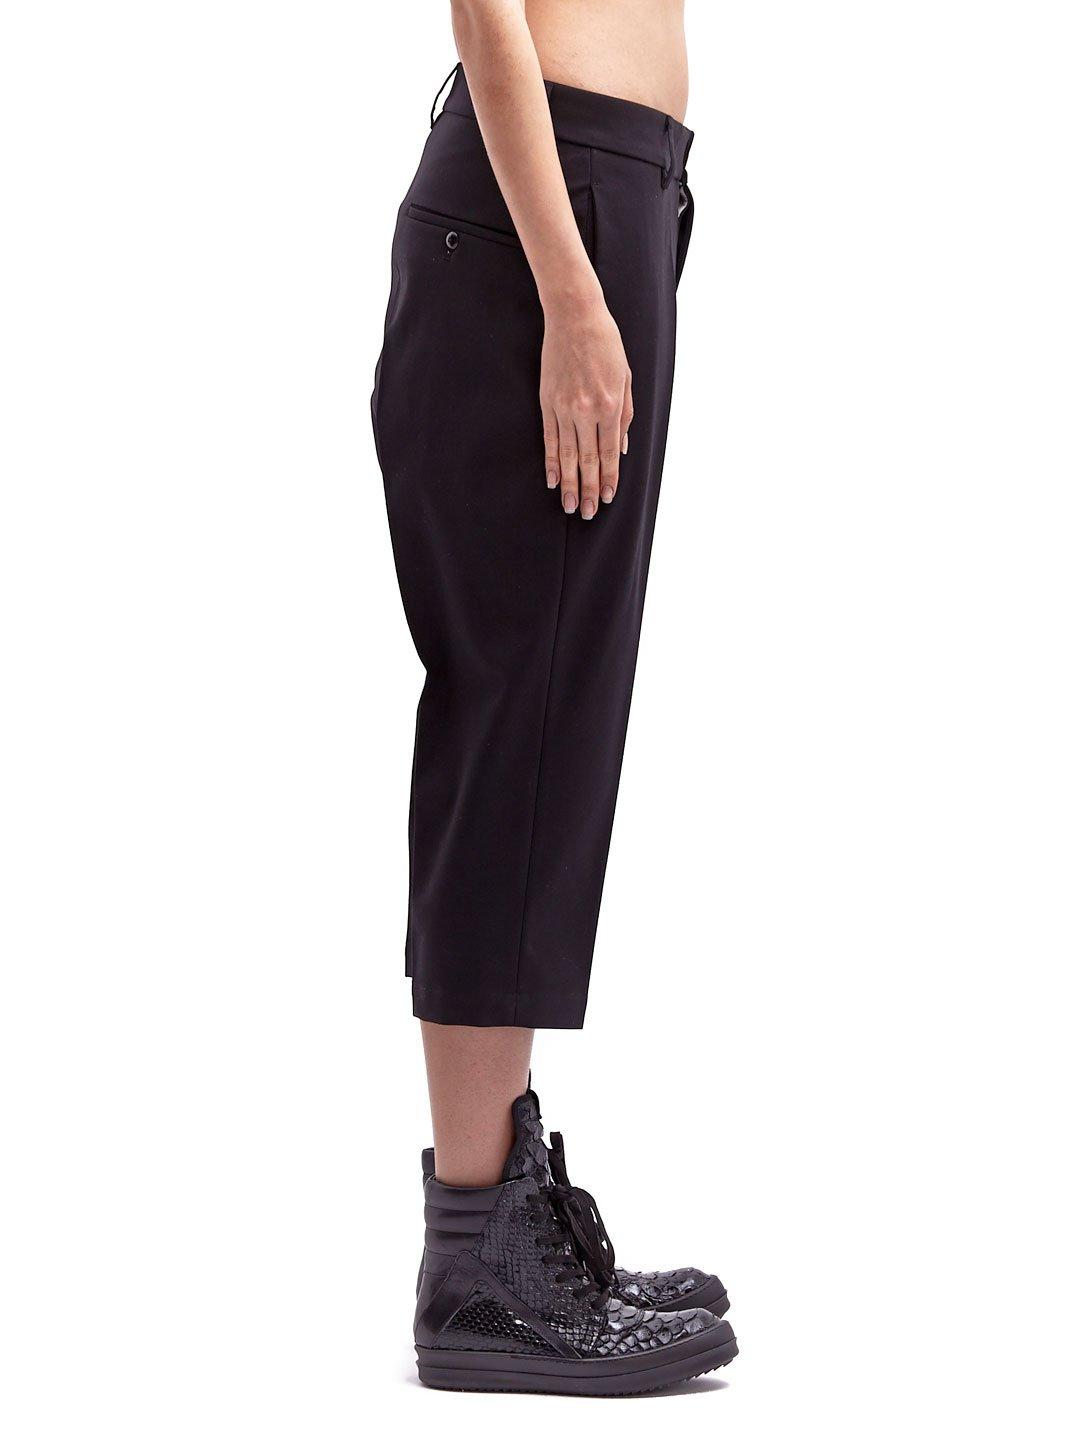 Simple New Giro Mobility Tailored Pants  Women39s Jet Black 4  Ekovrtsi